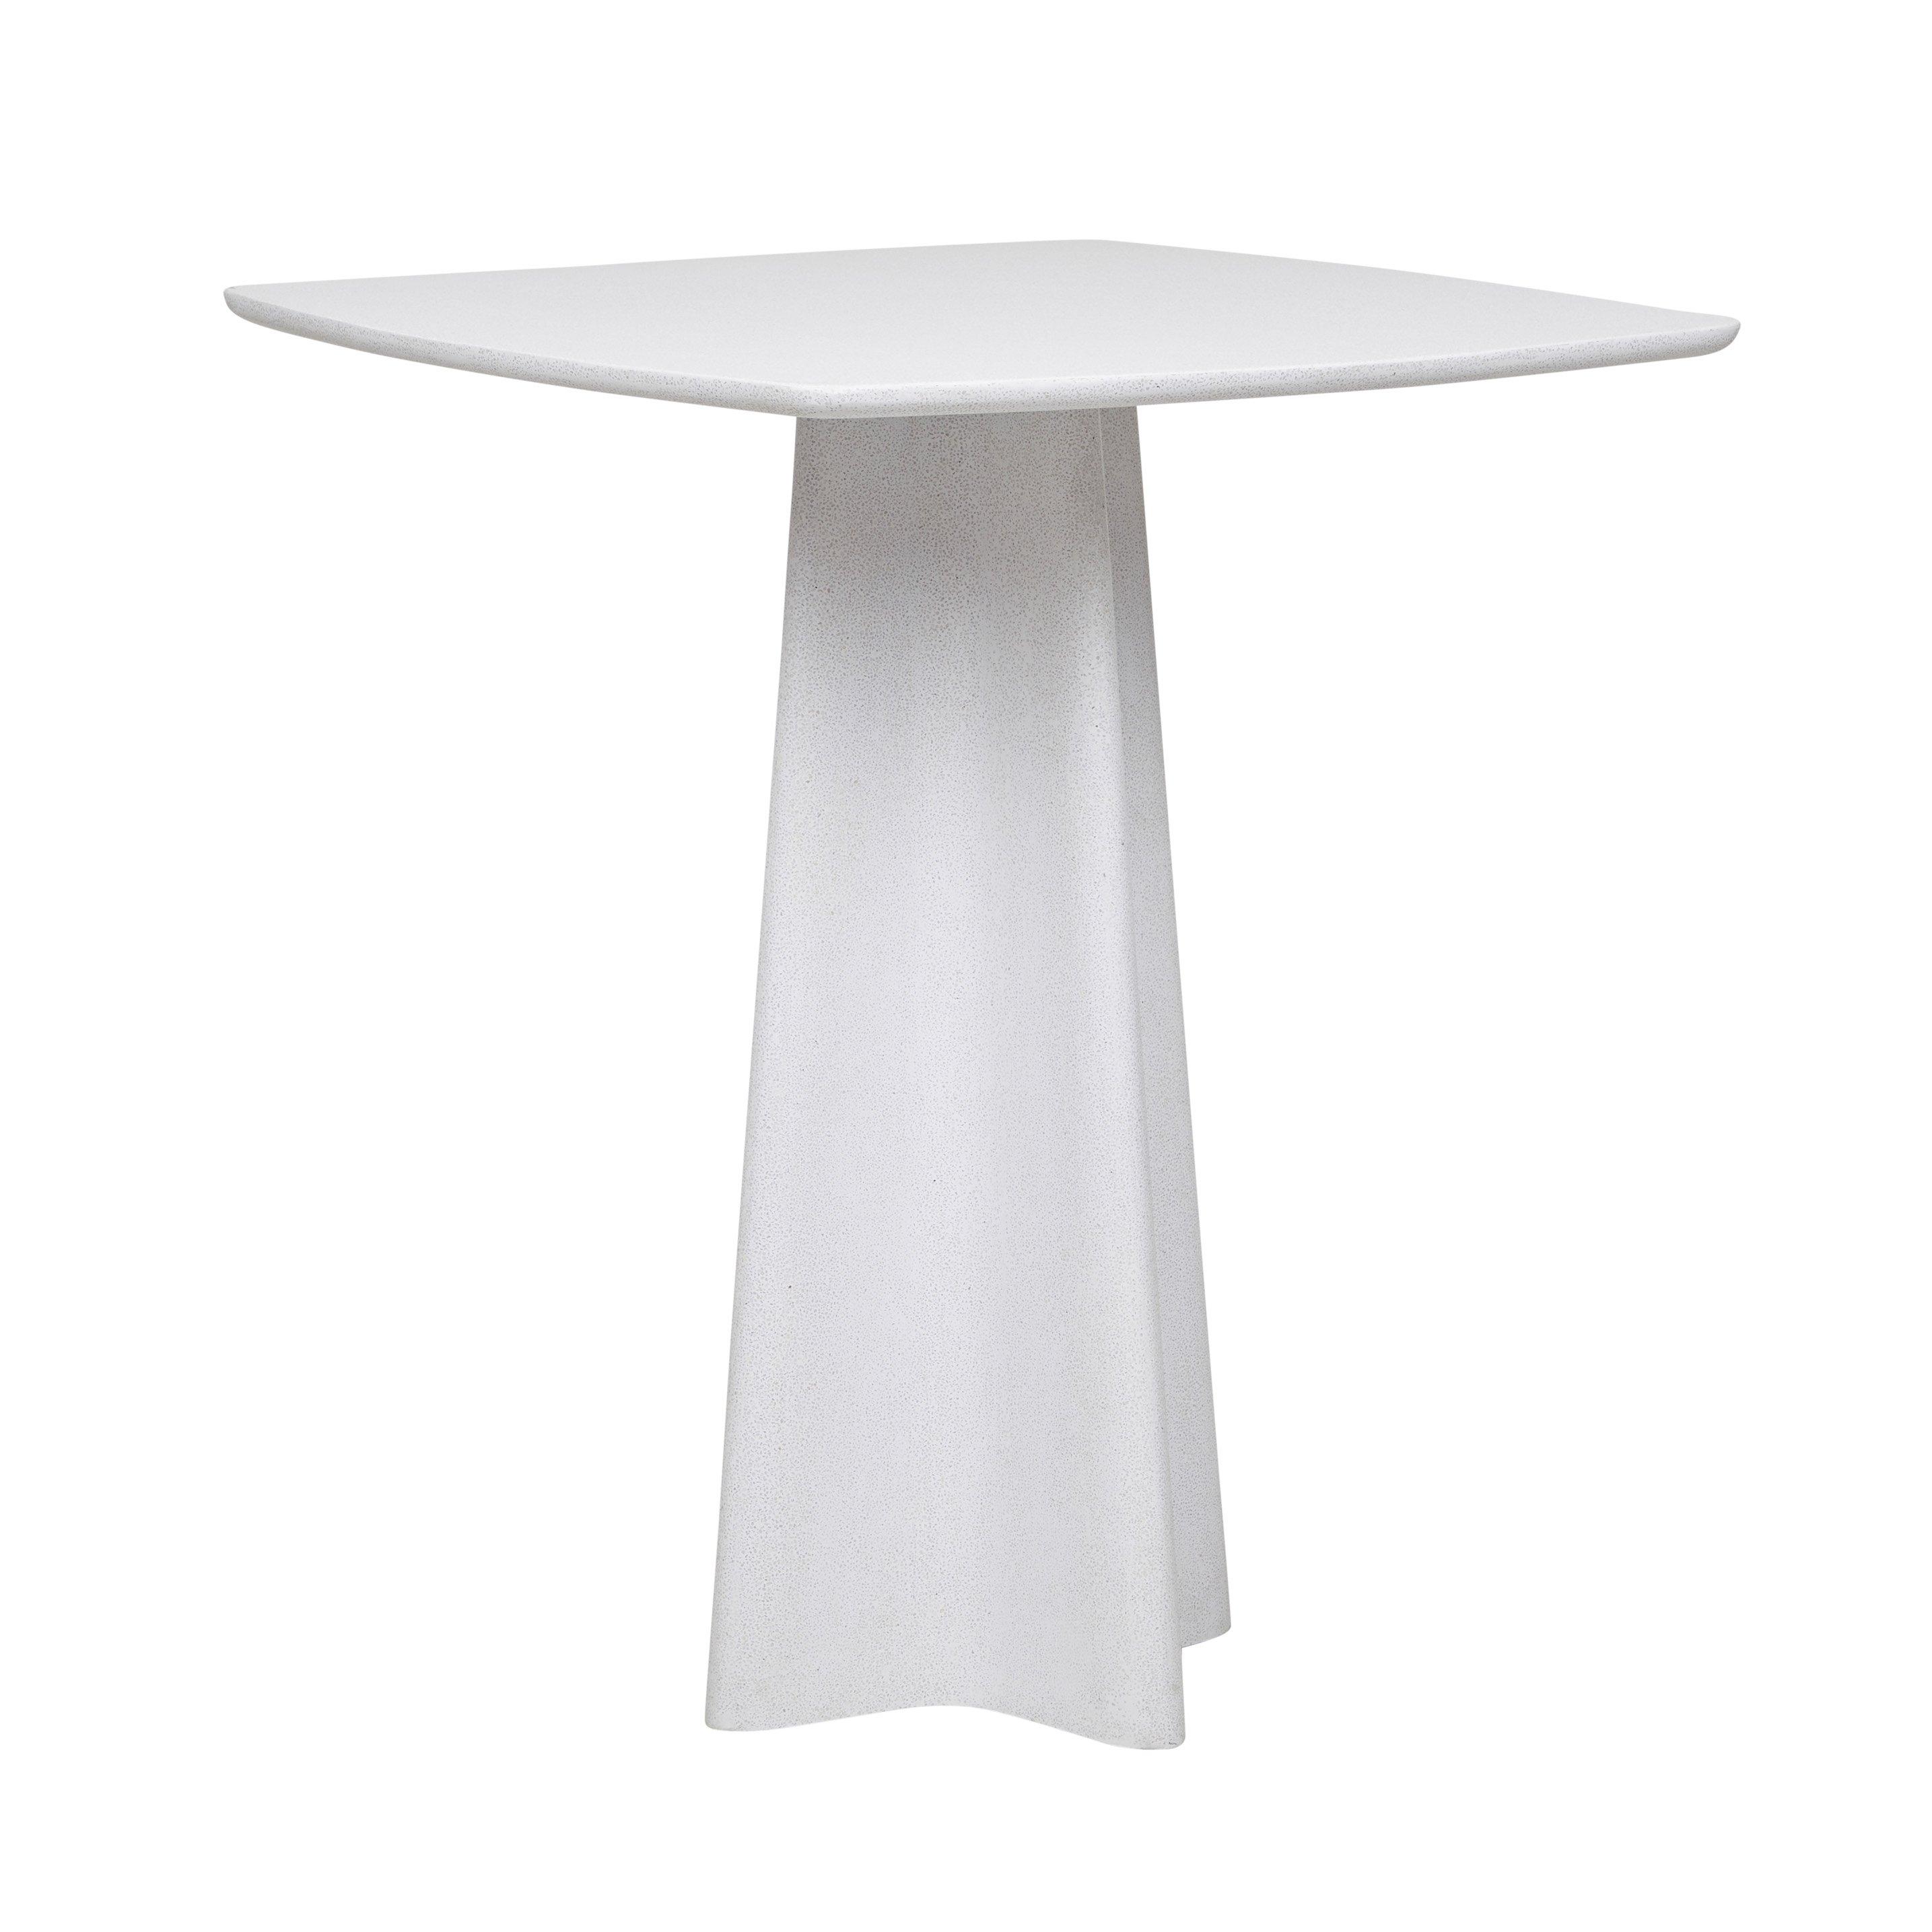 Furniture Hero-Images Dining-Tables livorno-bar-02